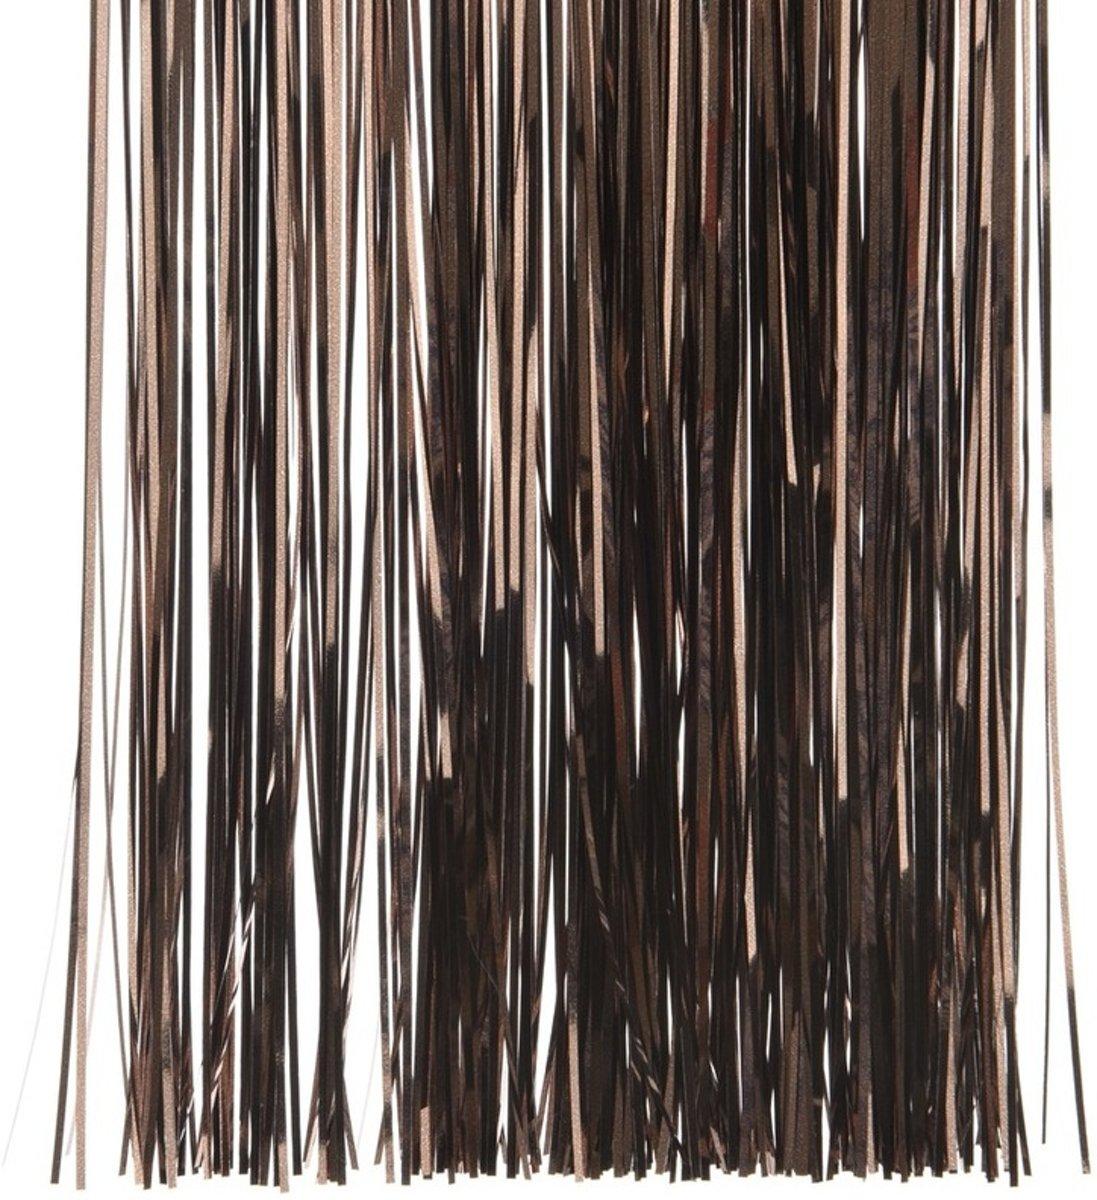 Donker bruine kerstversiering folie slierten 50 cm kopen